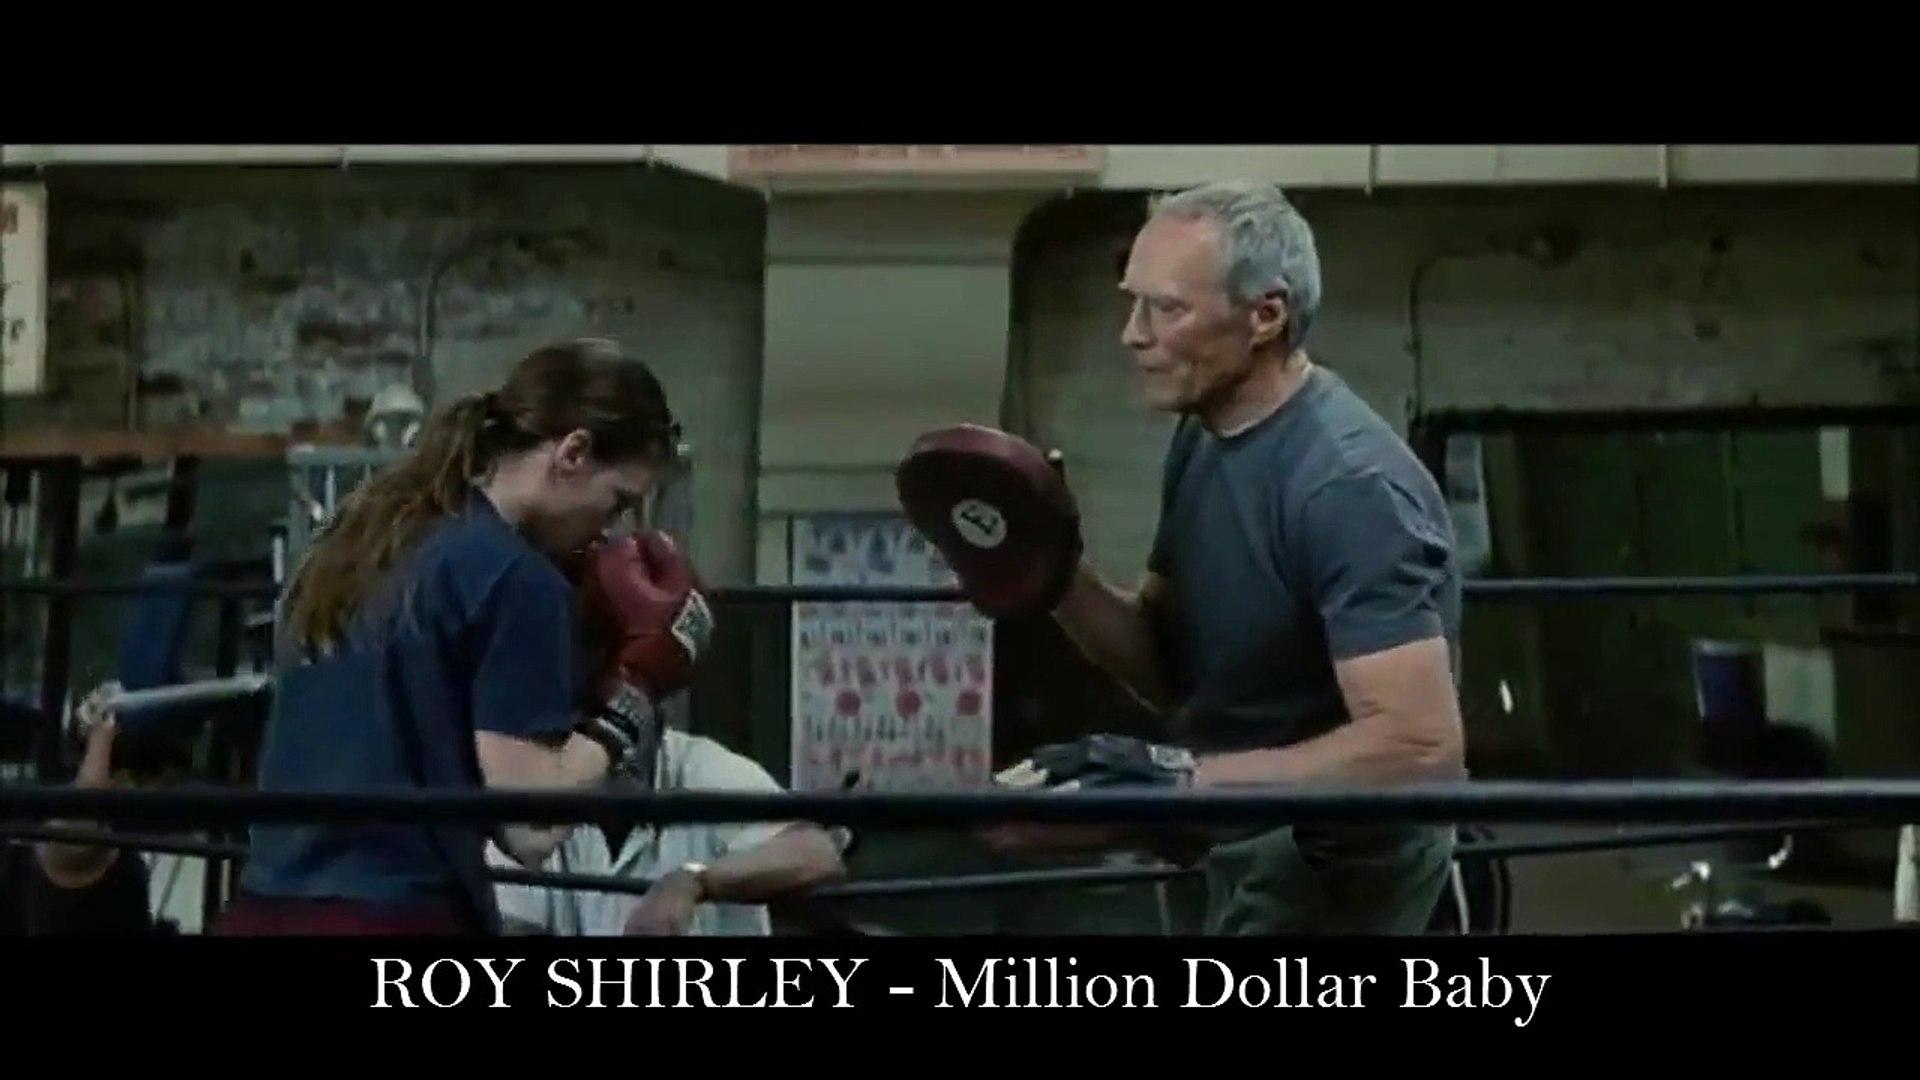 ROY SHIRLEY - Million Dollar Baby